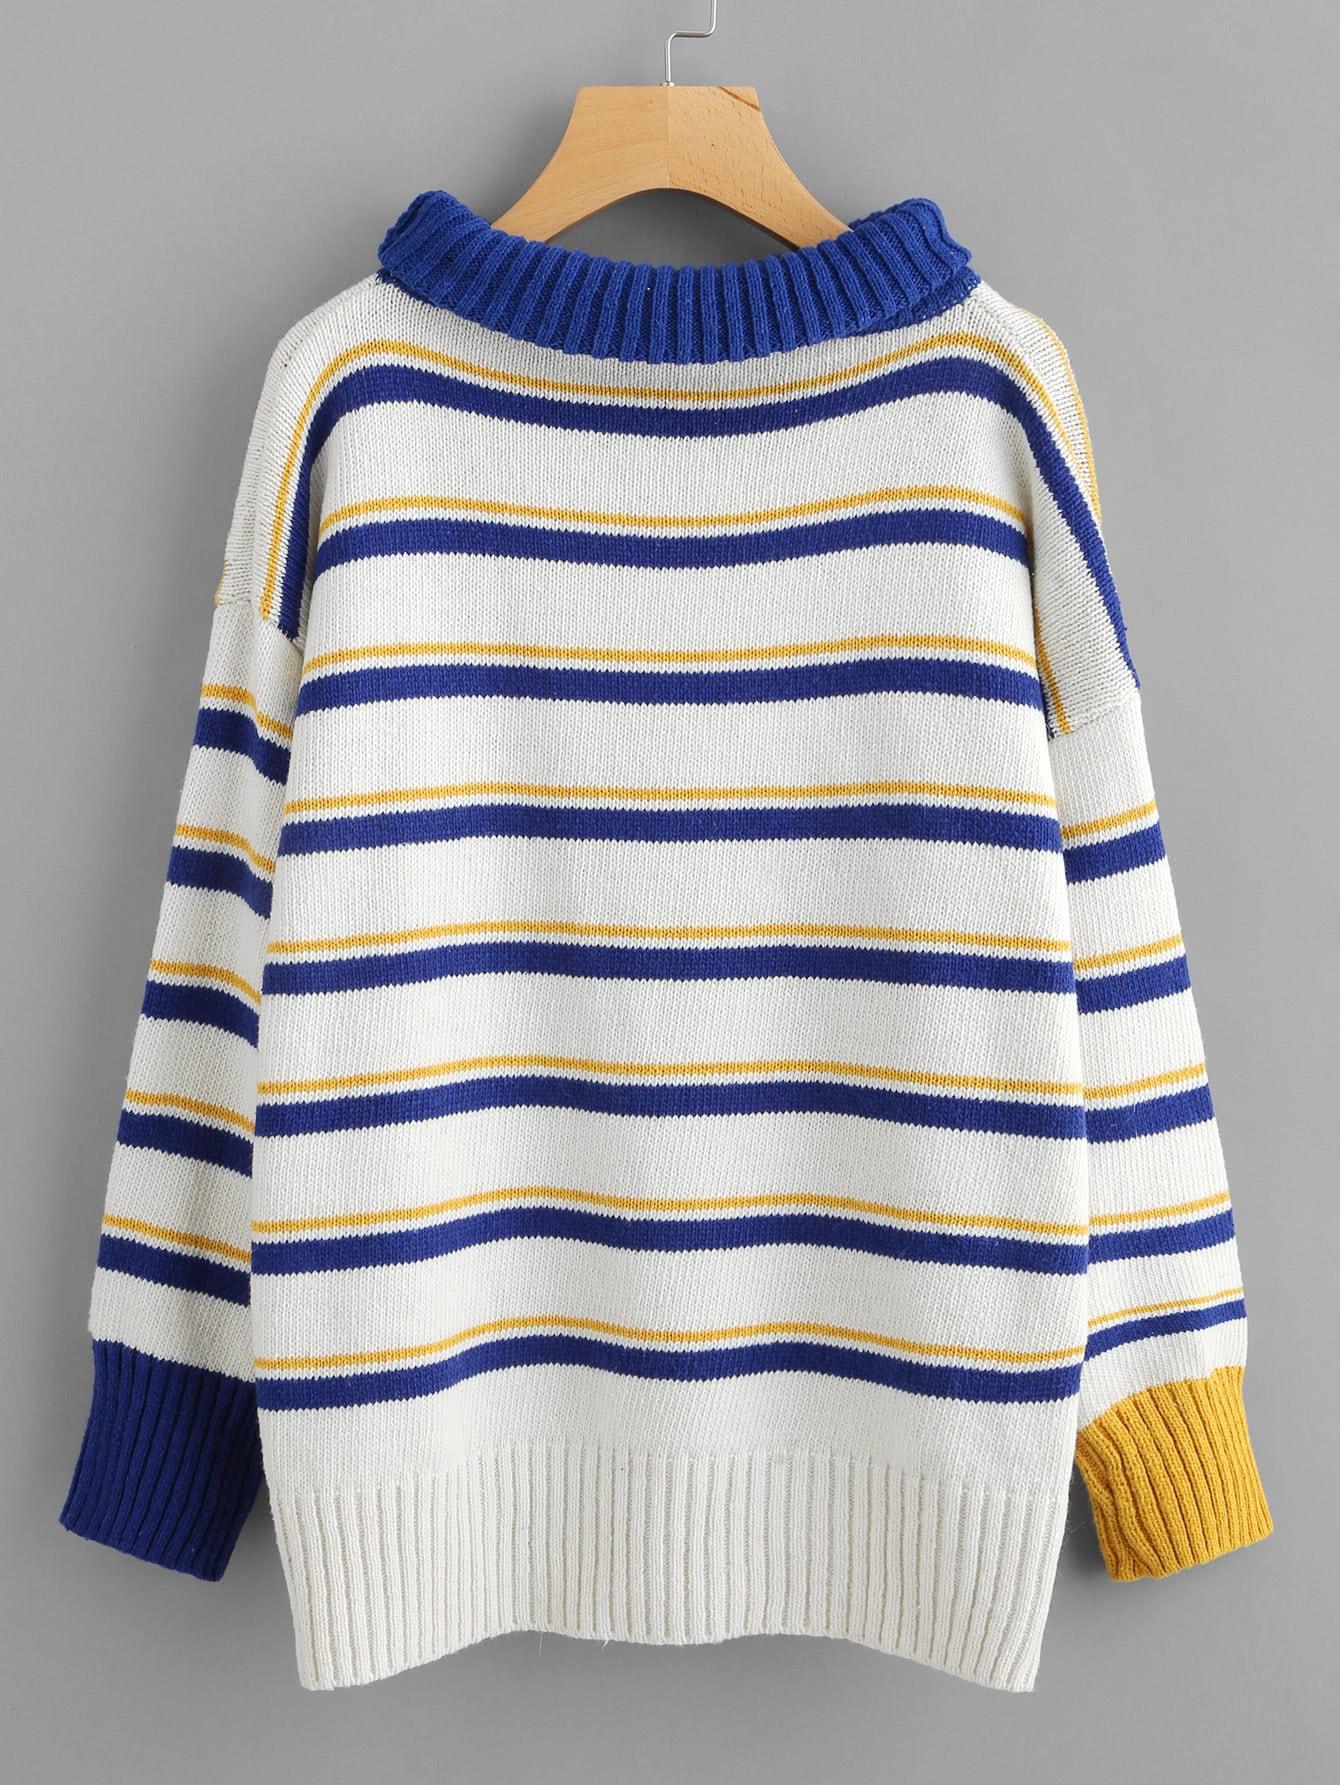 Contrast Trim Drop Shoulder Striped Sweater -SheIn(Sheinside)